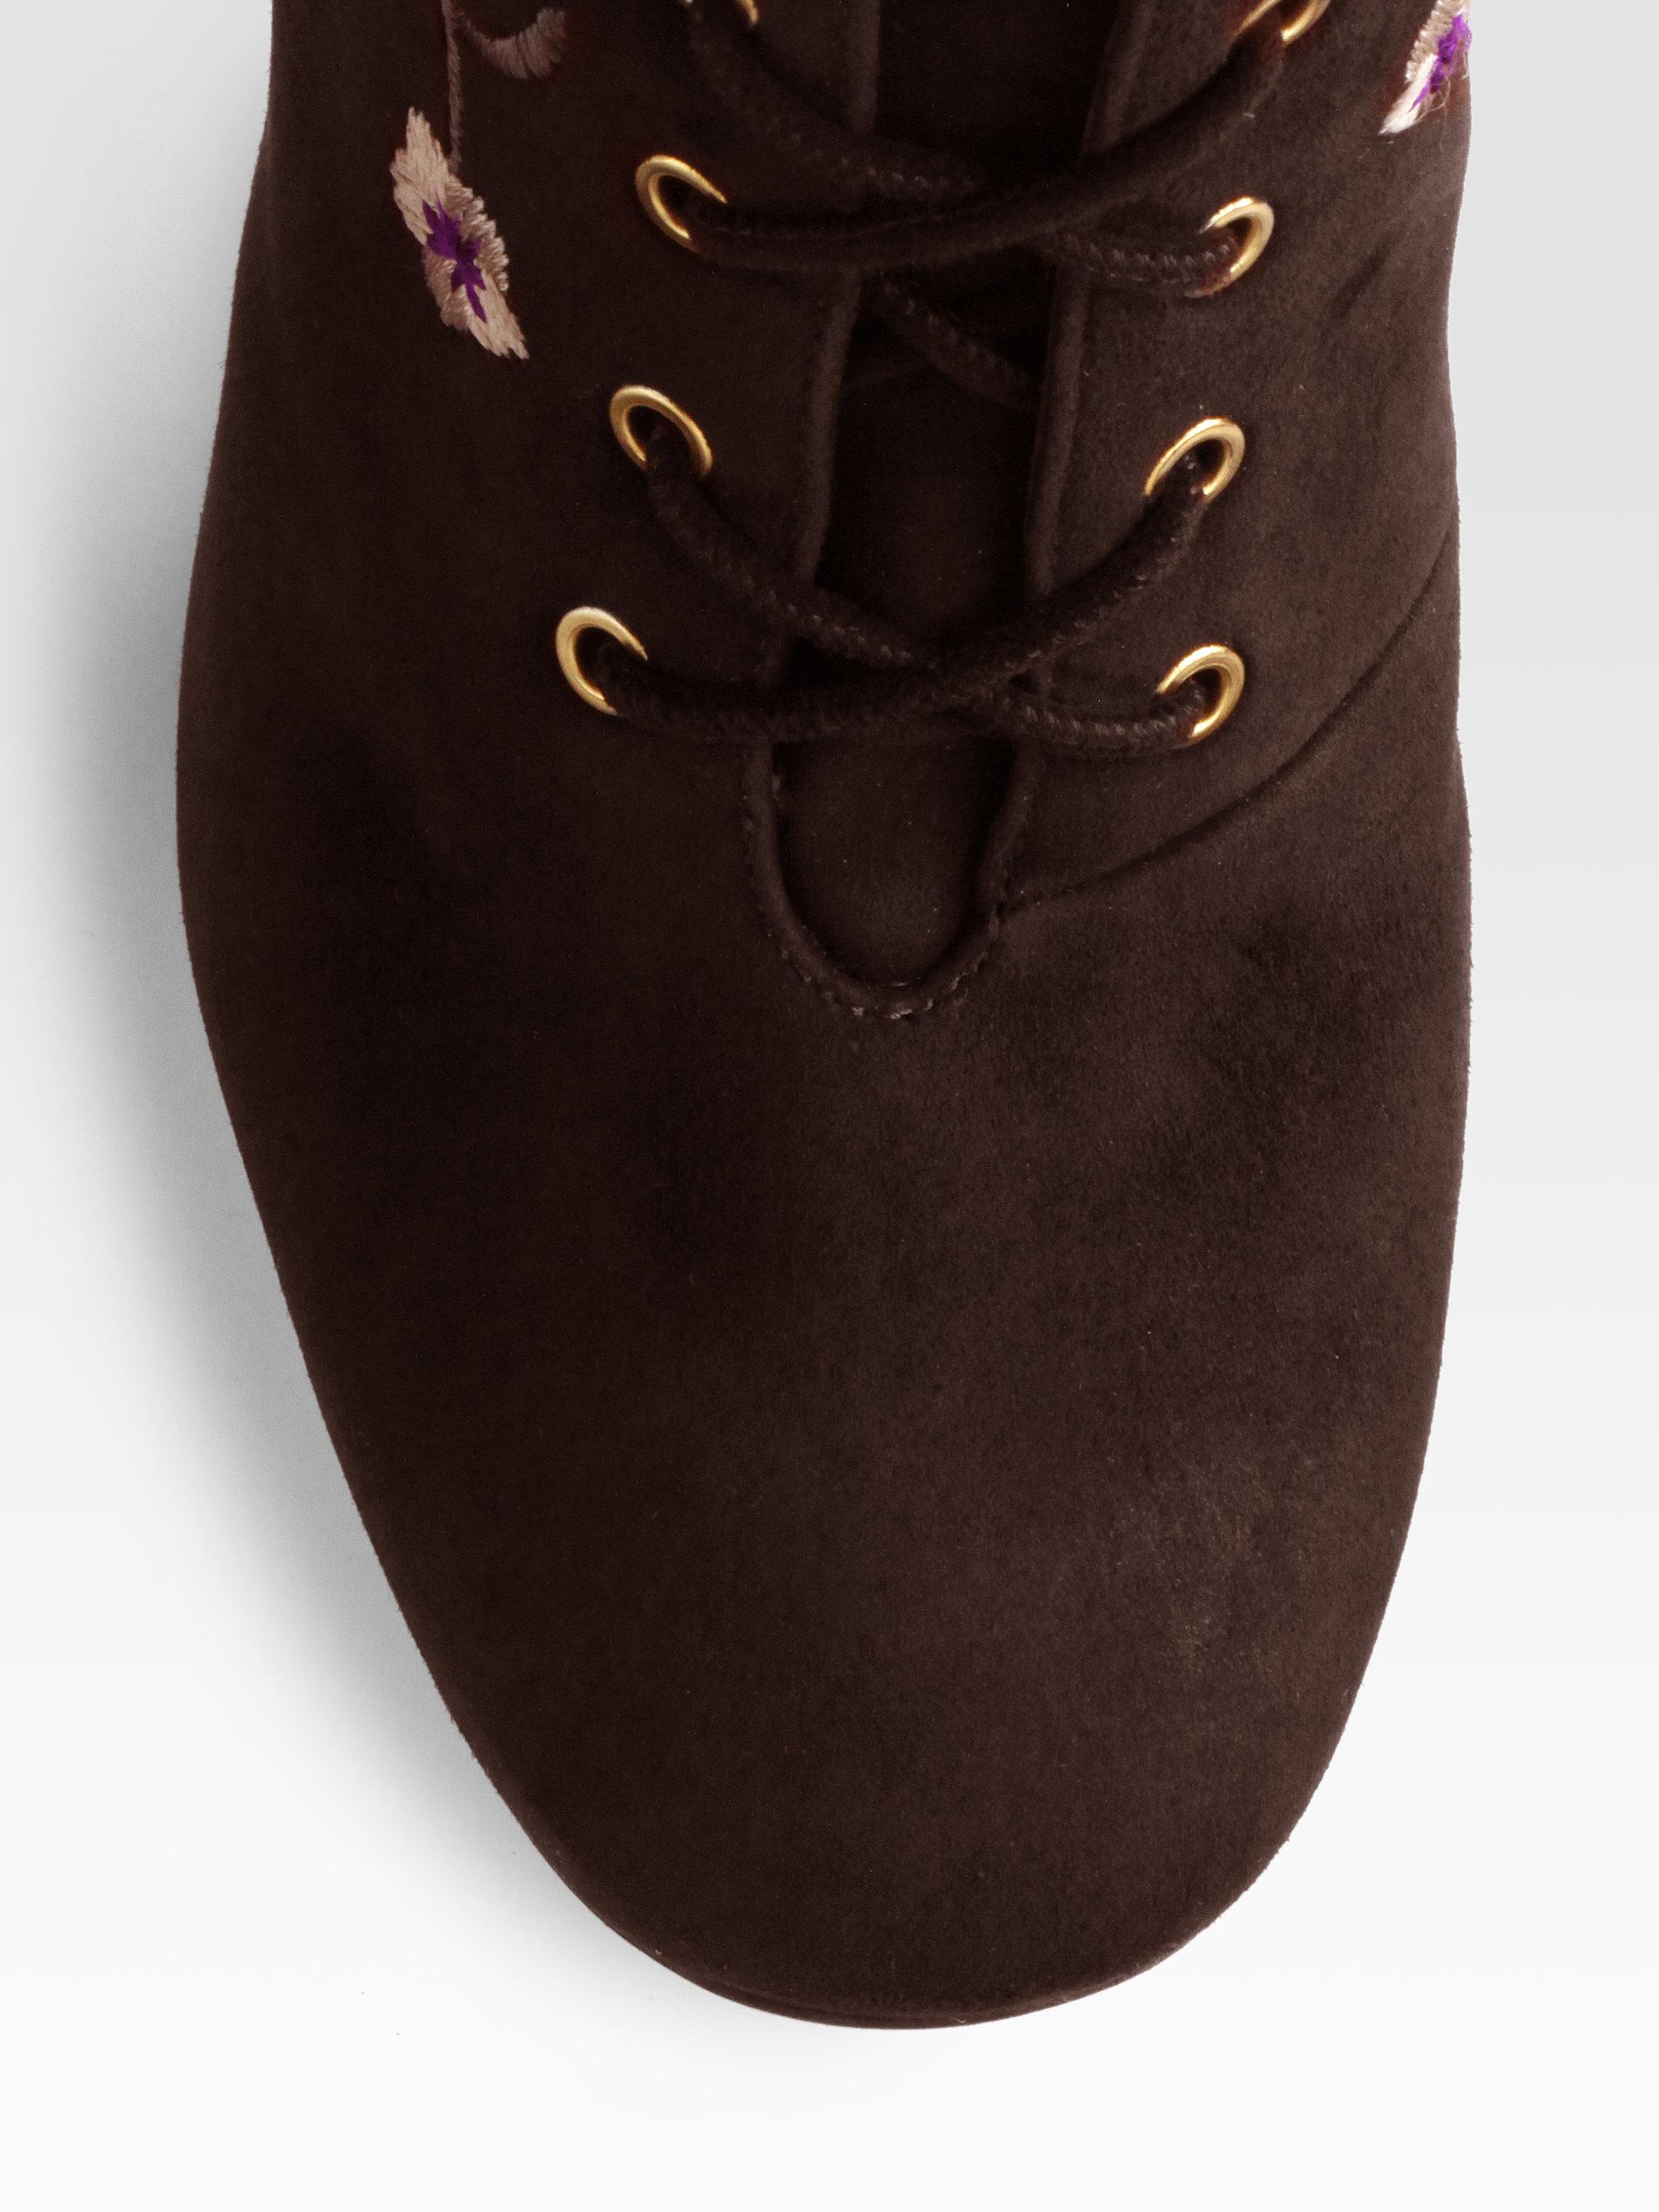 dd427454cc5 Lyst - Jimmy Choo Colorado Suede Kneehigh Laceup Boots in Black